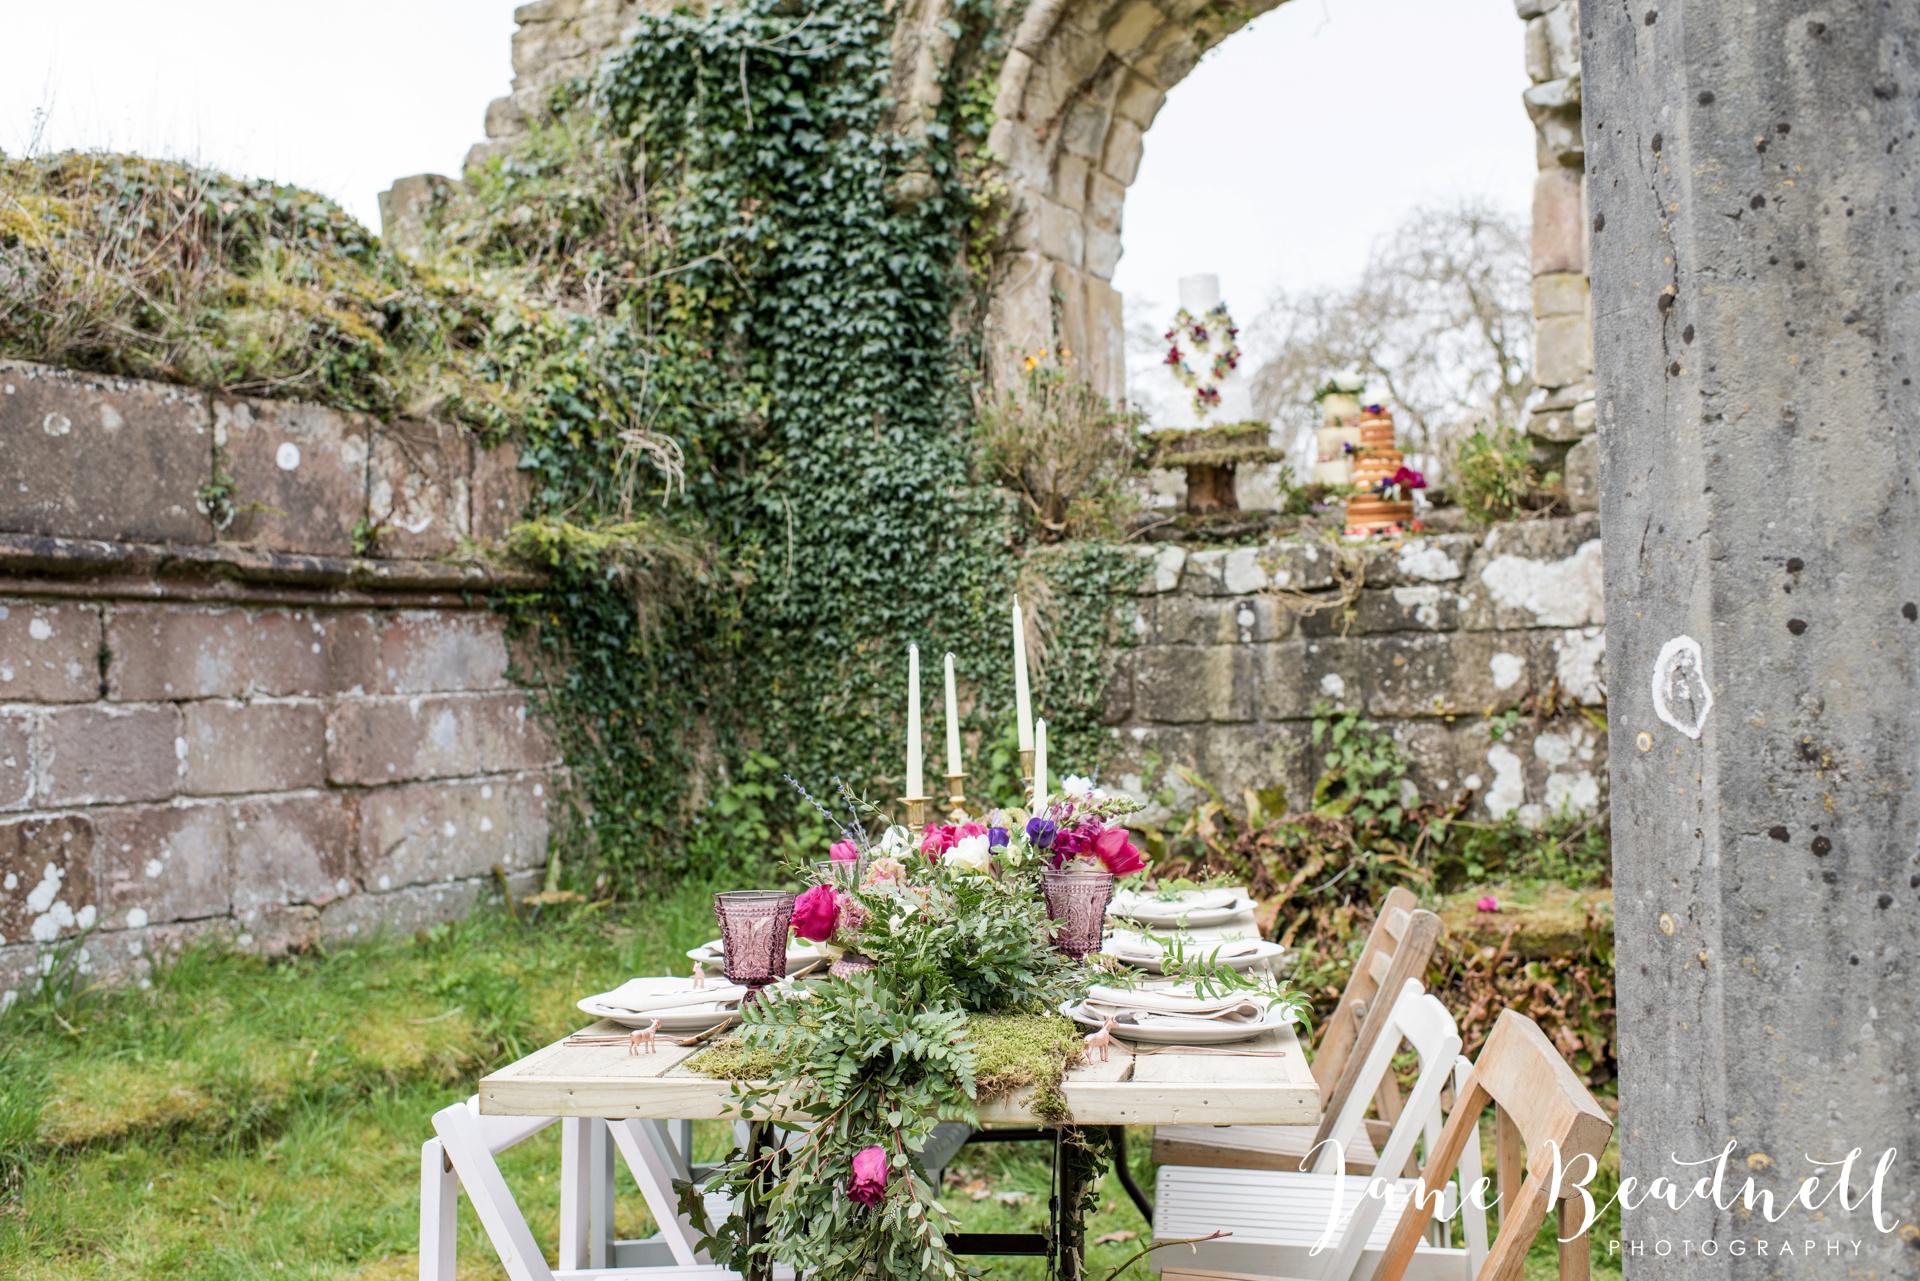 Jervaulx Abbey wedding photography fine art Yorkshire wedding photographer jane beadnell_0014